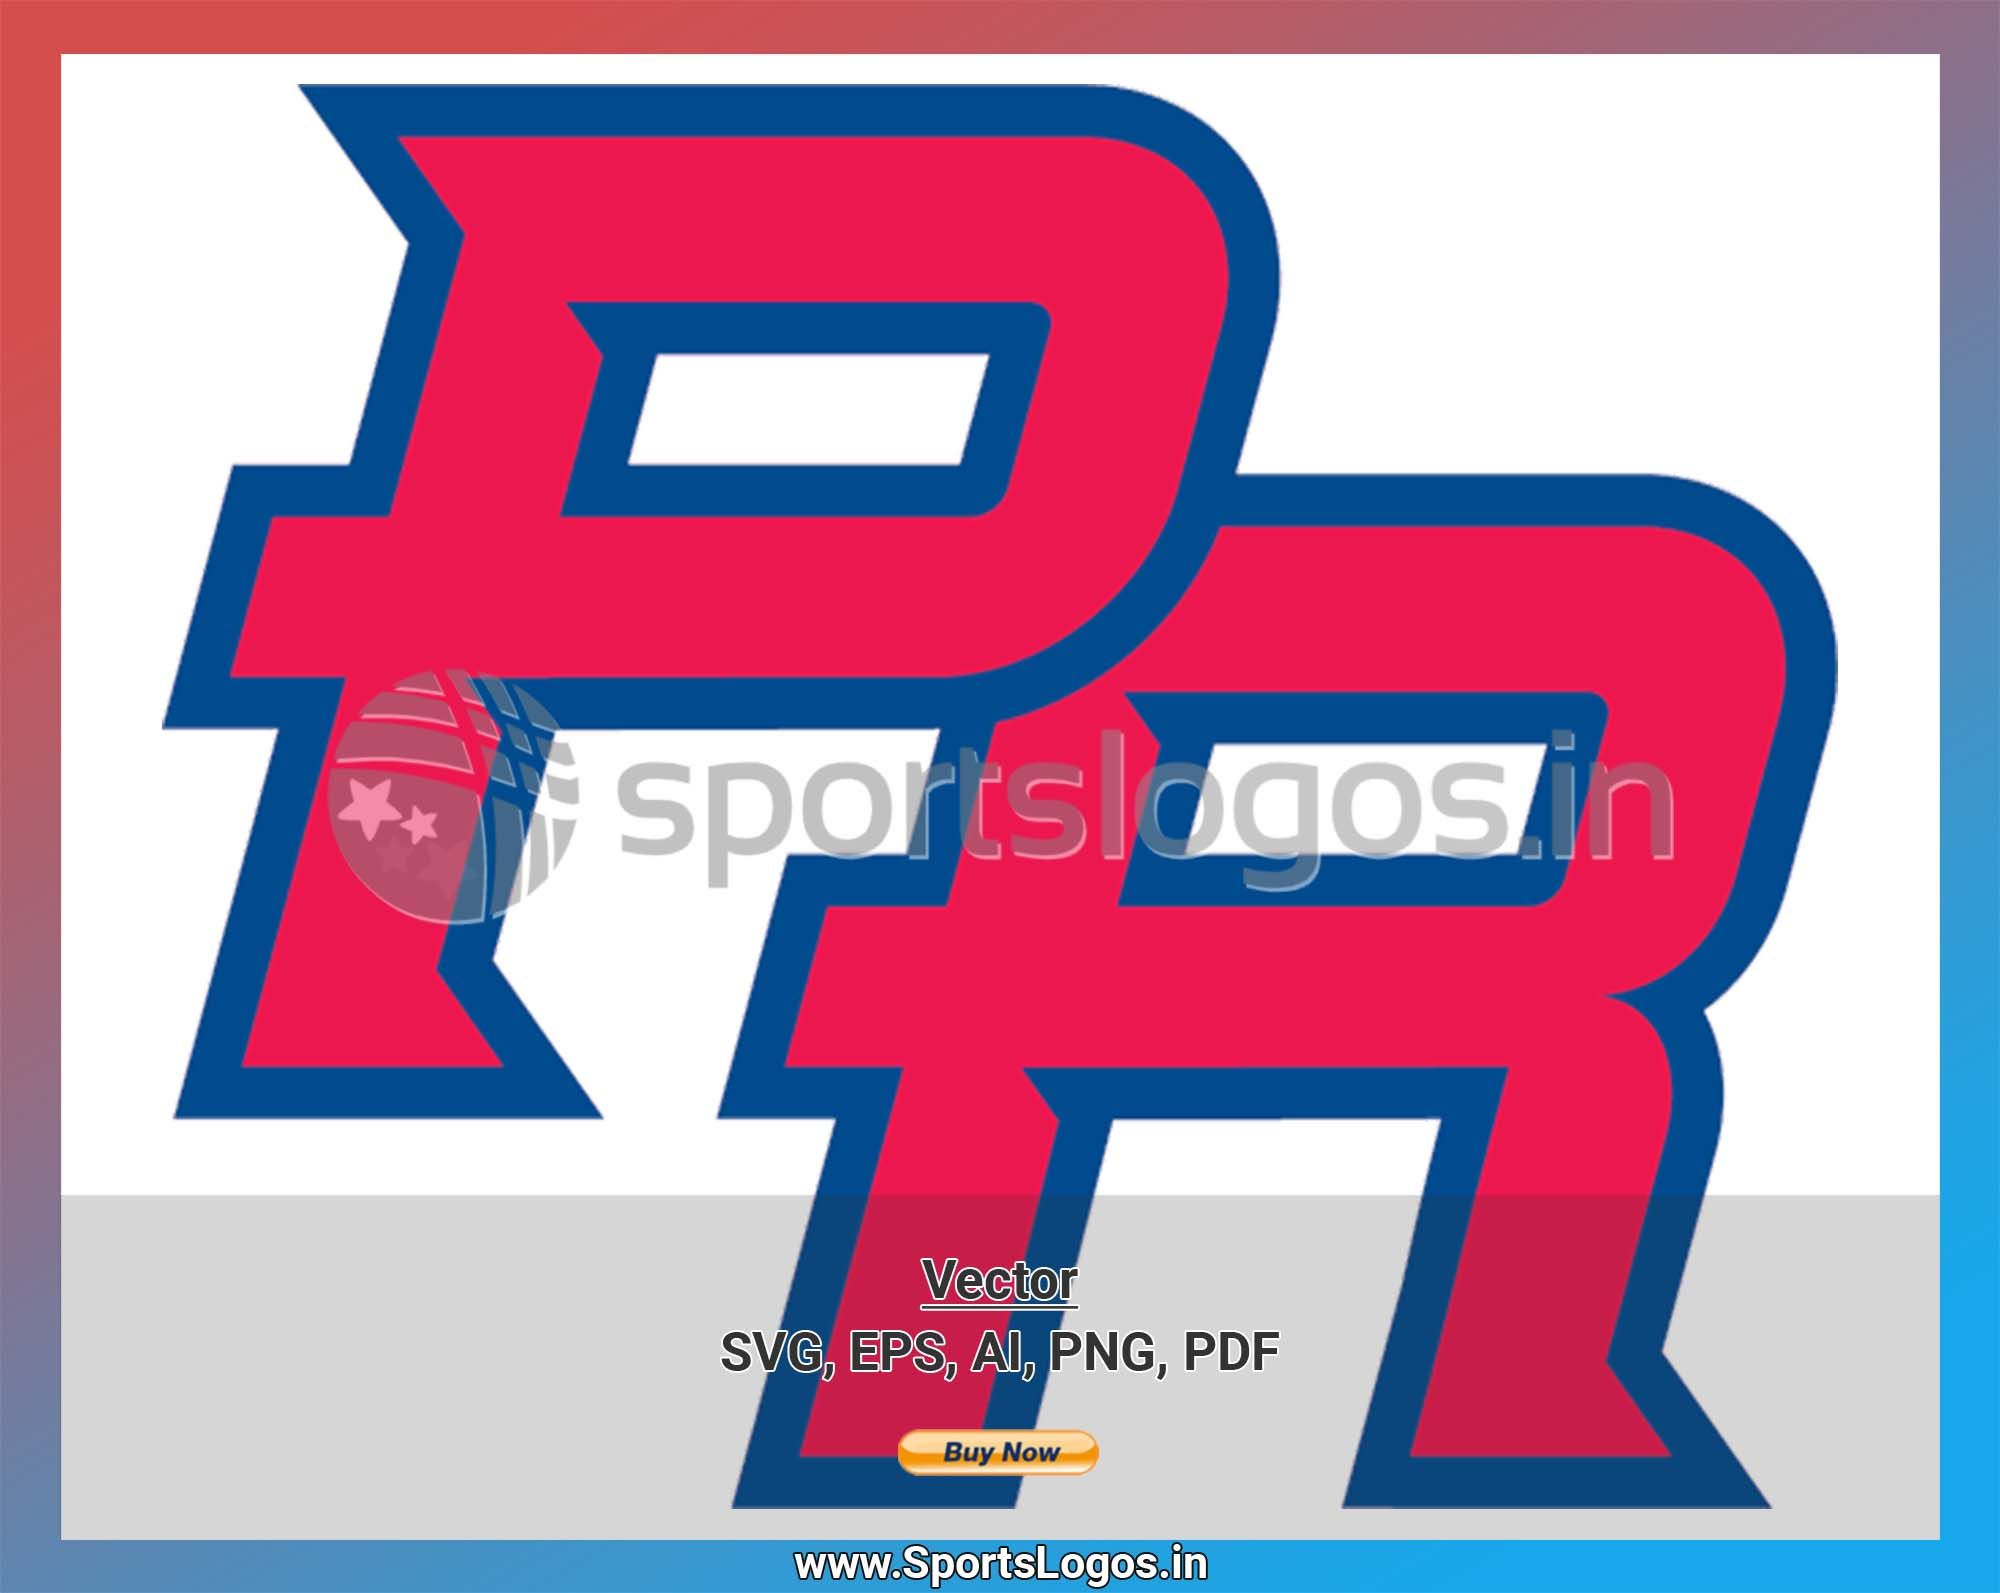 Puerto Rico Baseball Sports Vector Svg Logo In 5 Formats Spln003540 Sports Logos Embroidery Vector For Nfl Nba Nhl Mlb Milb And More World Baseball Classic Baseball Classic Sports Baseball